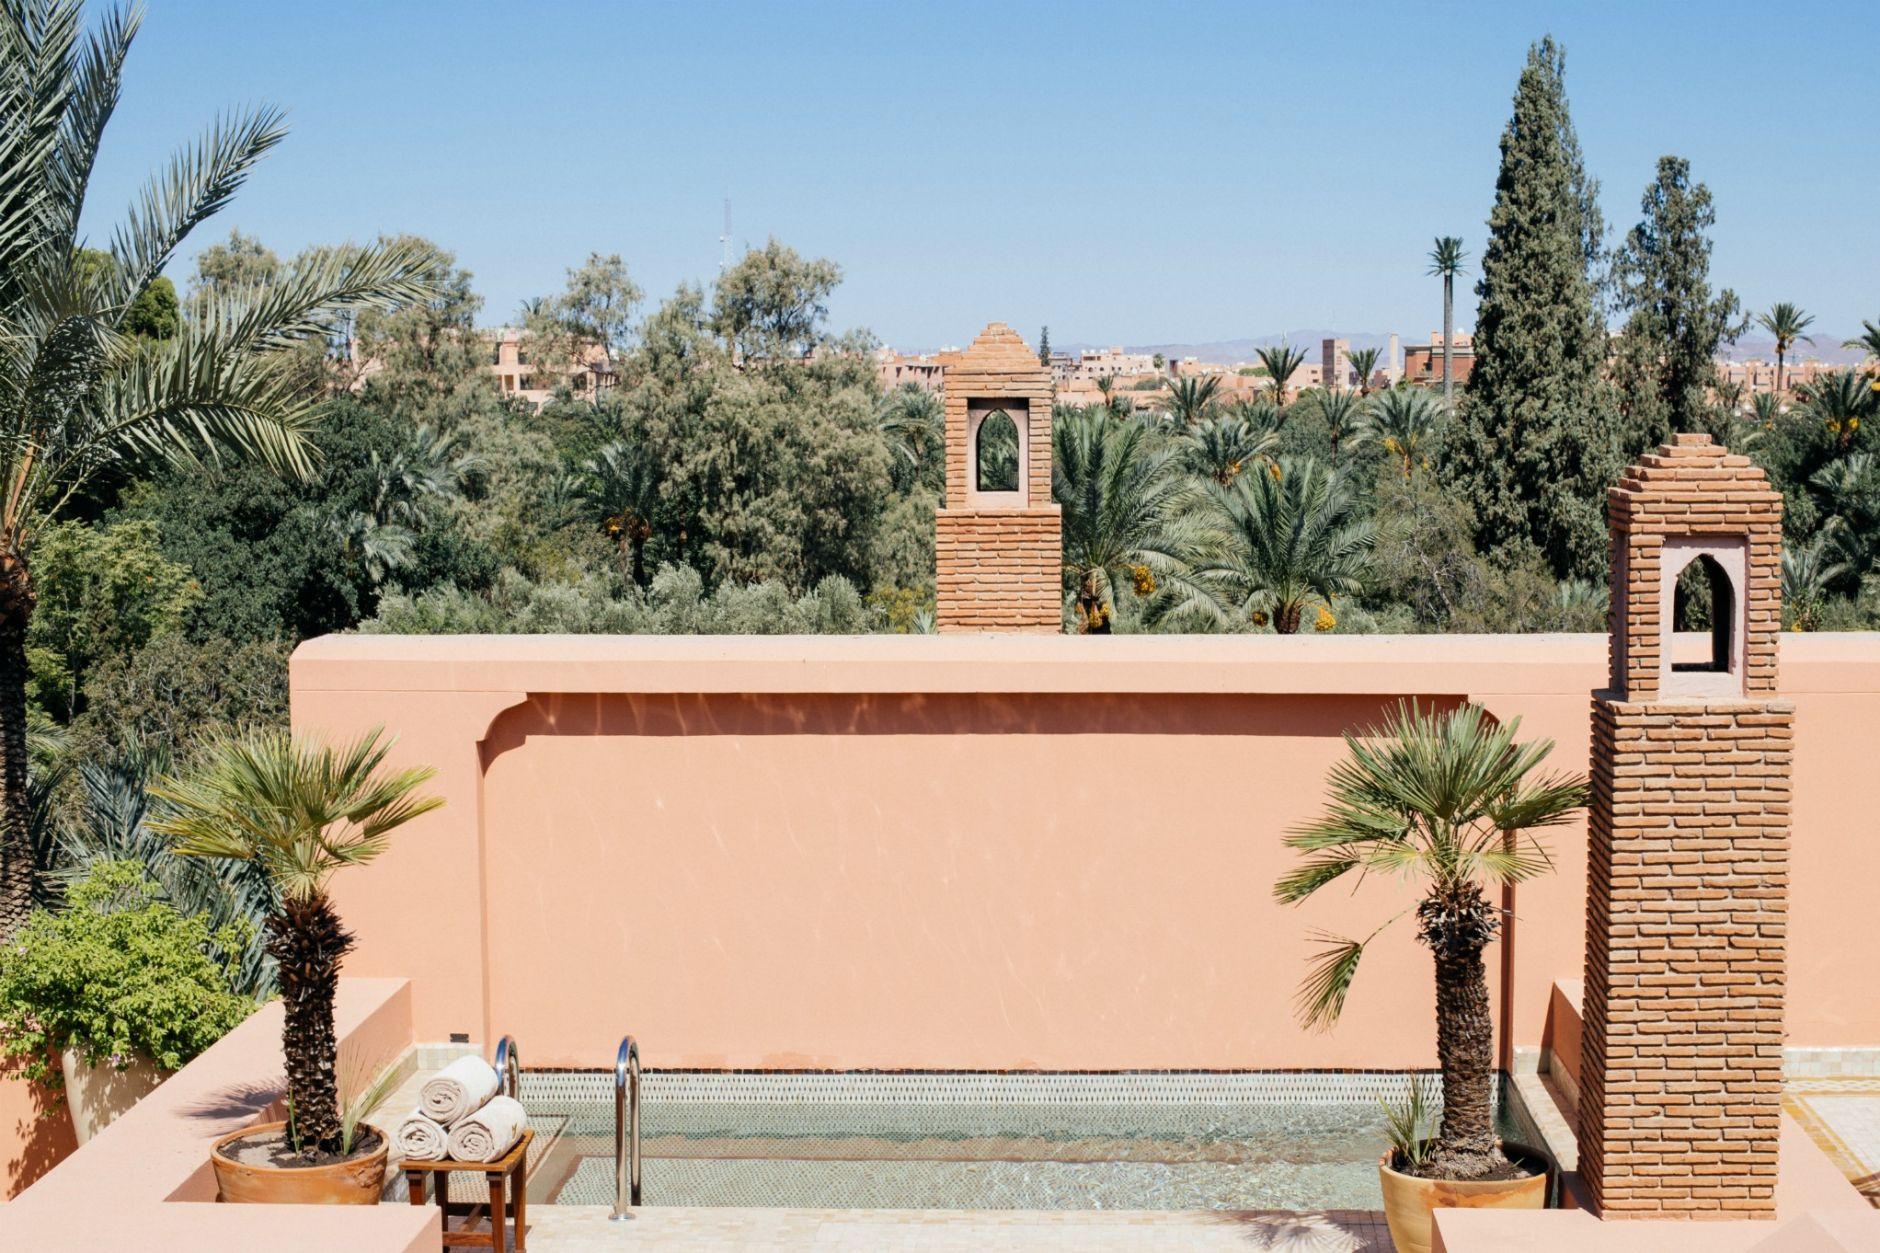 royal-mansour-hotel-luxury-marrakesch-marrakesh-morocco-edisa-shahini-disicouture-blog-04